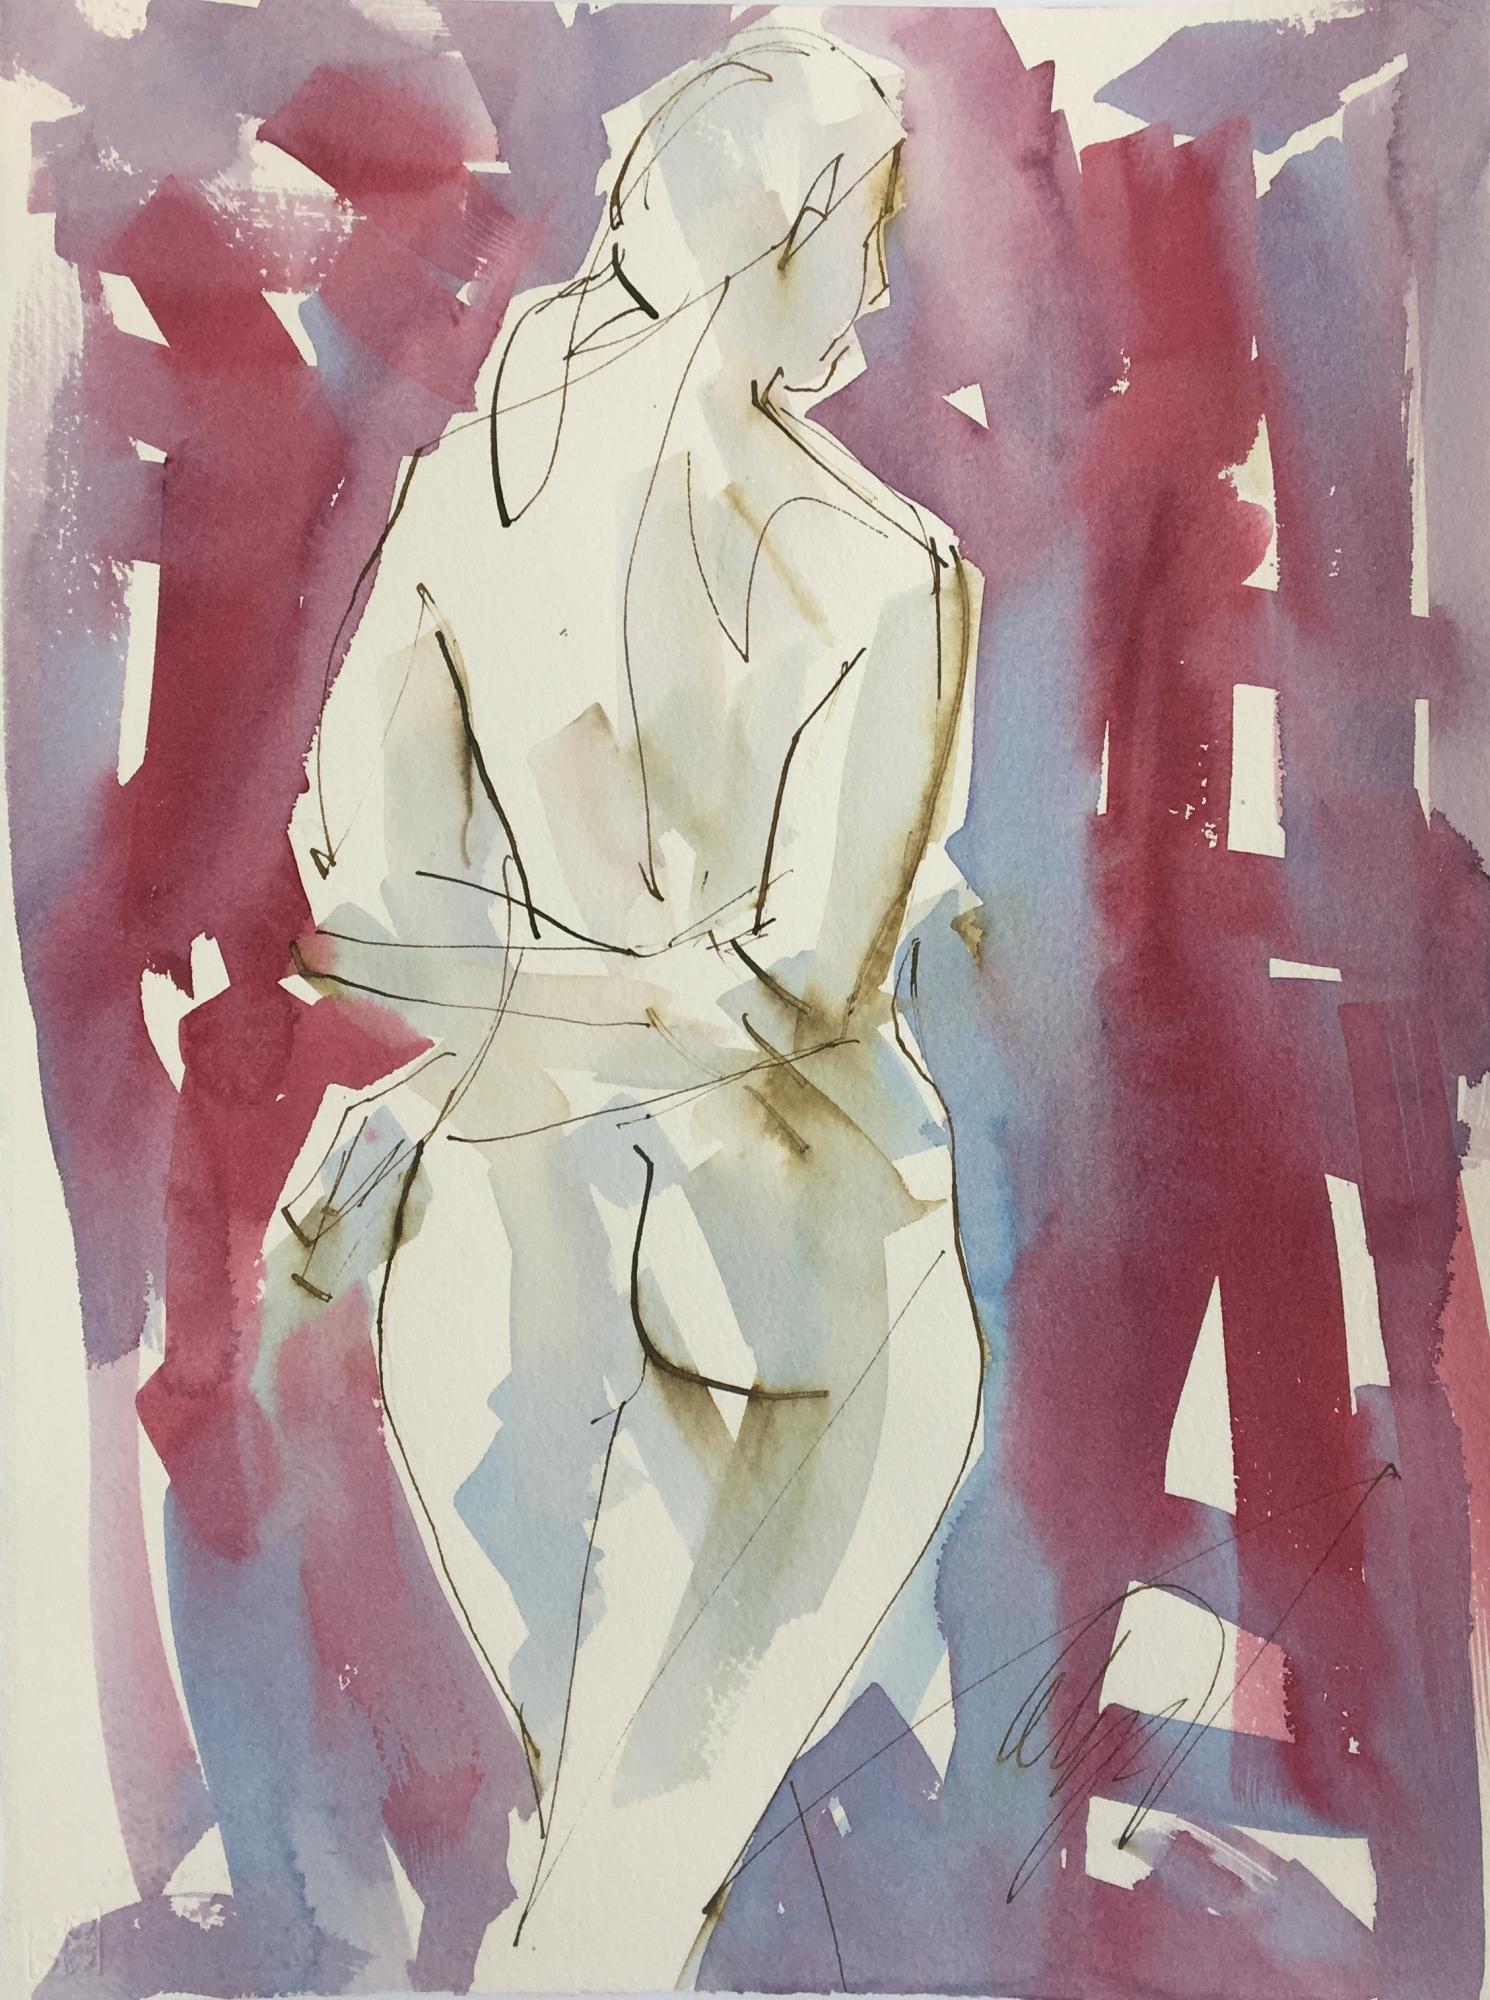 Hands Crossed Nude  by Mel Delija